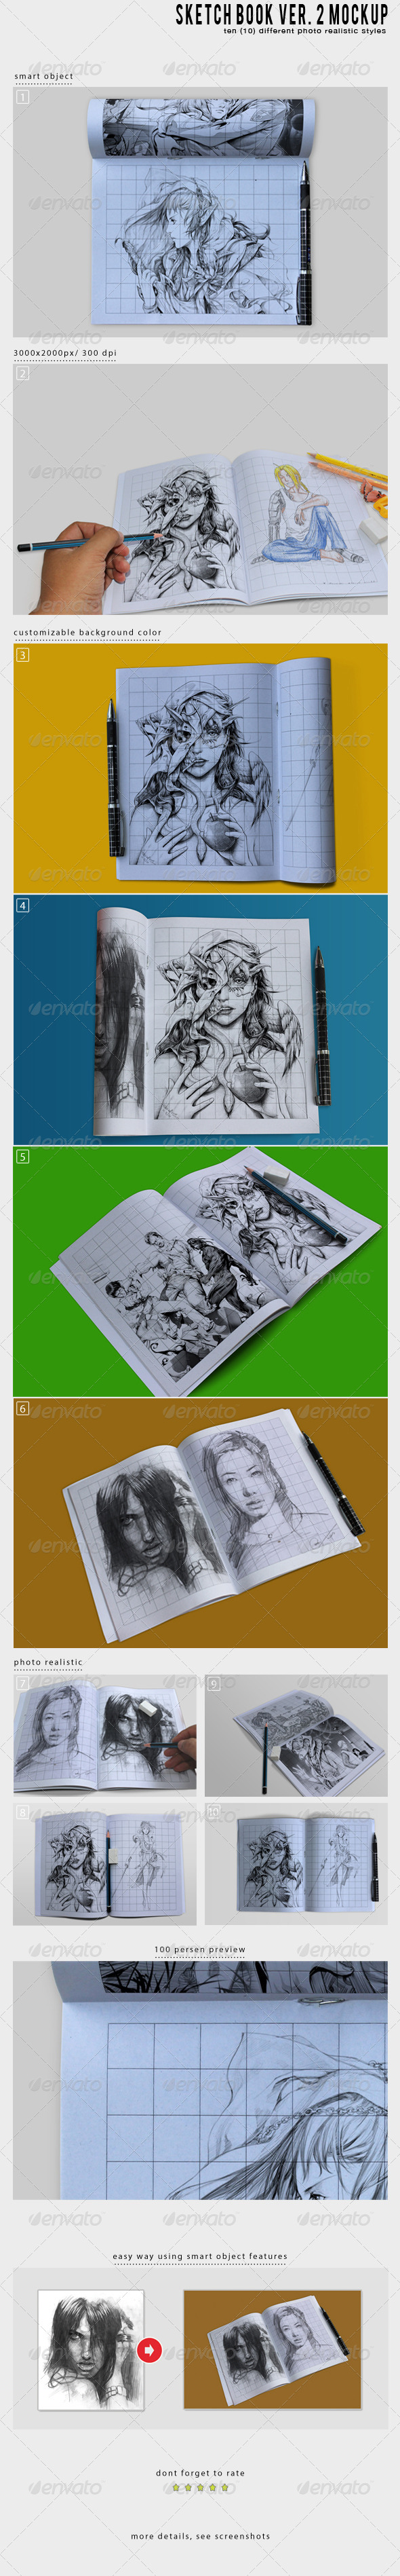 Sketch Book Ver. 2 Mockup - Miscellaneous Print